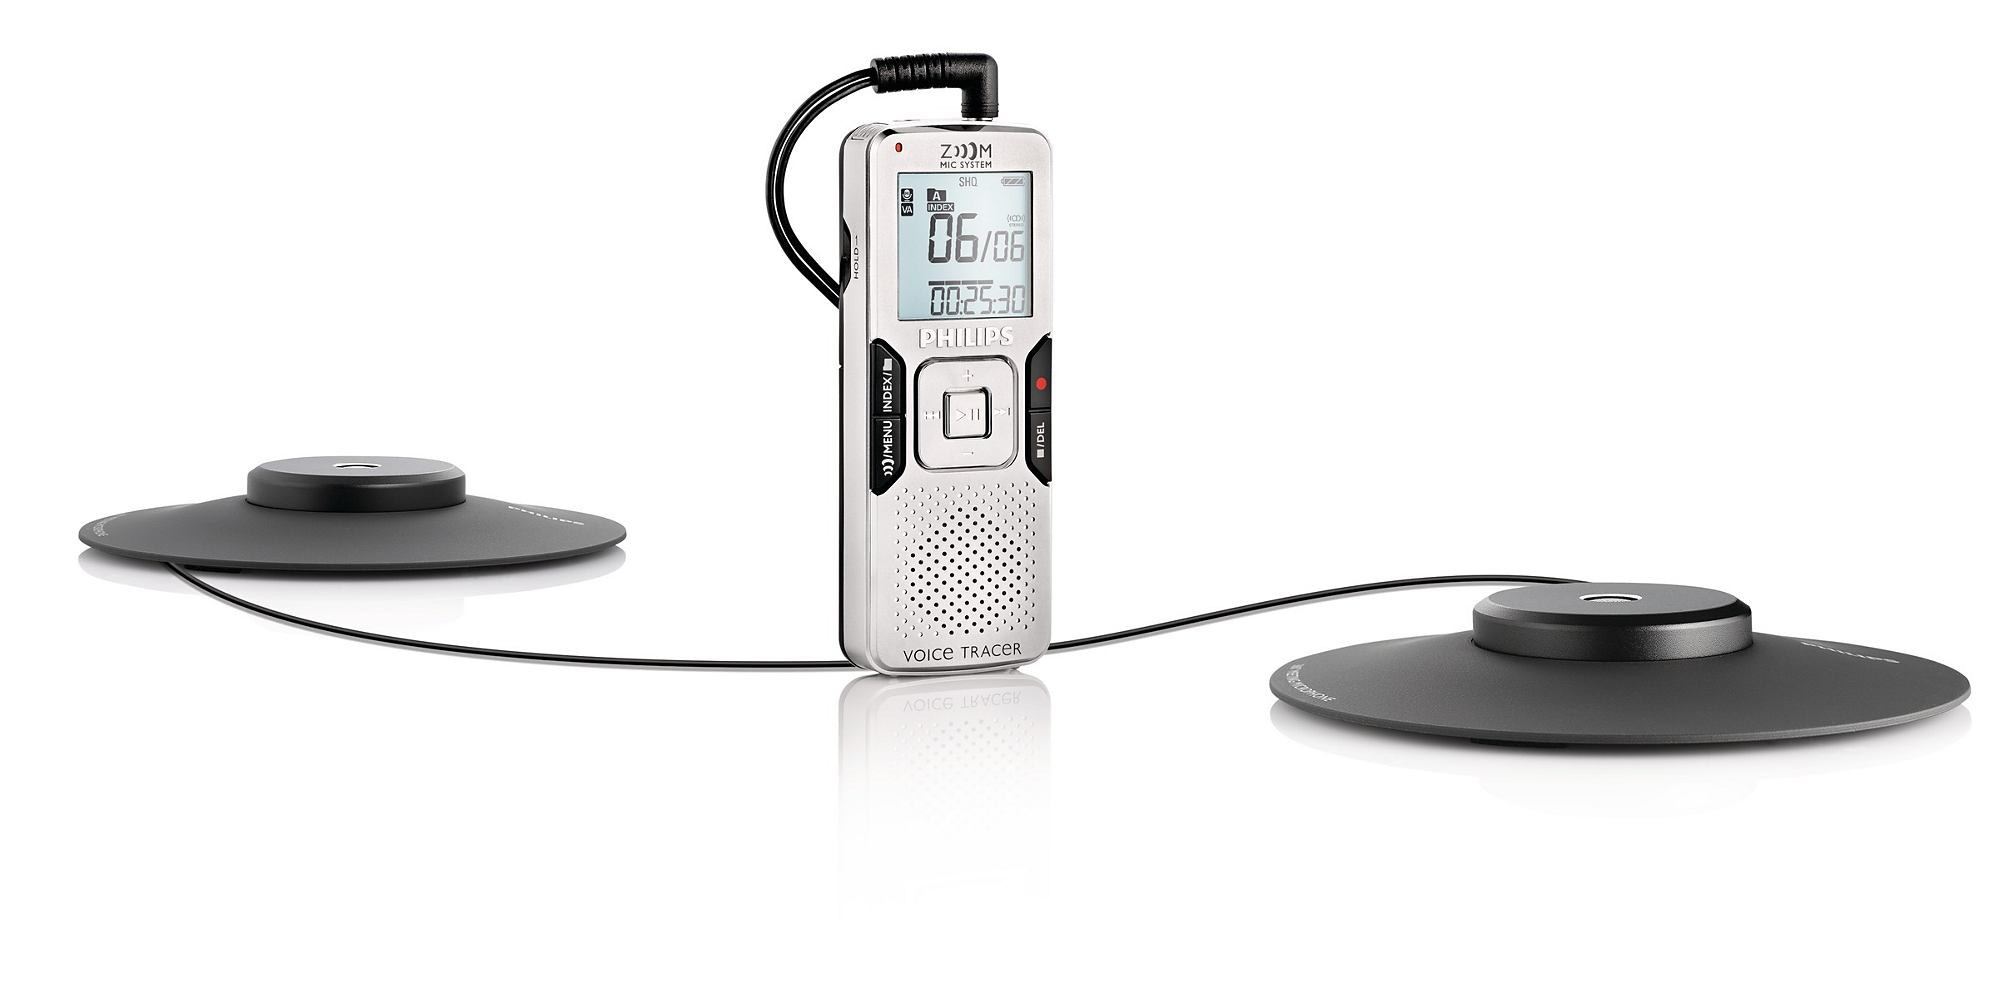 Philips LFH0898 Voice Tracer digital diktafon